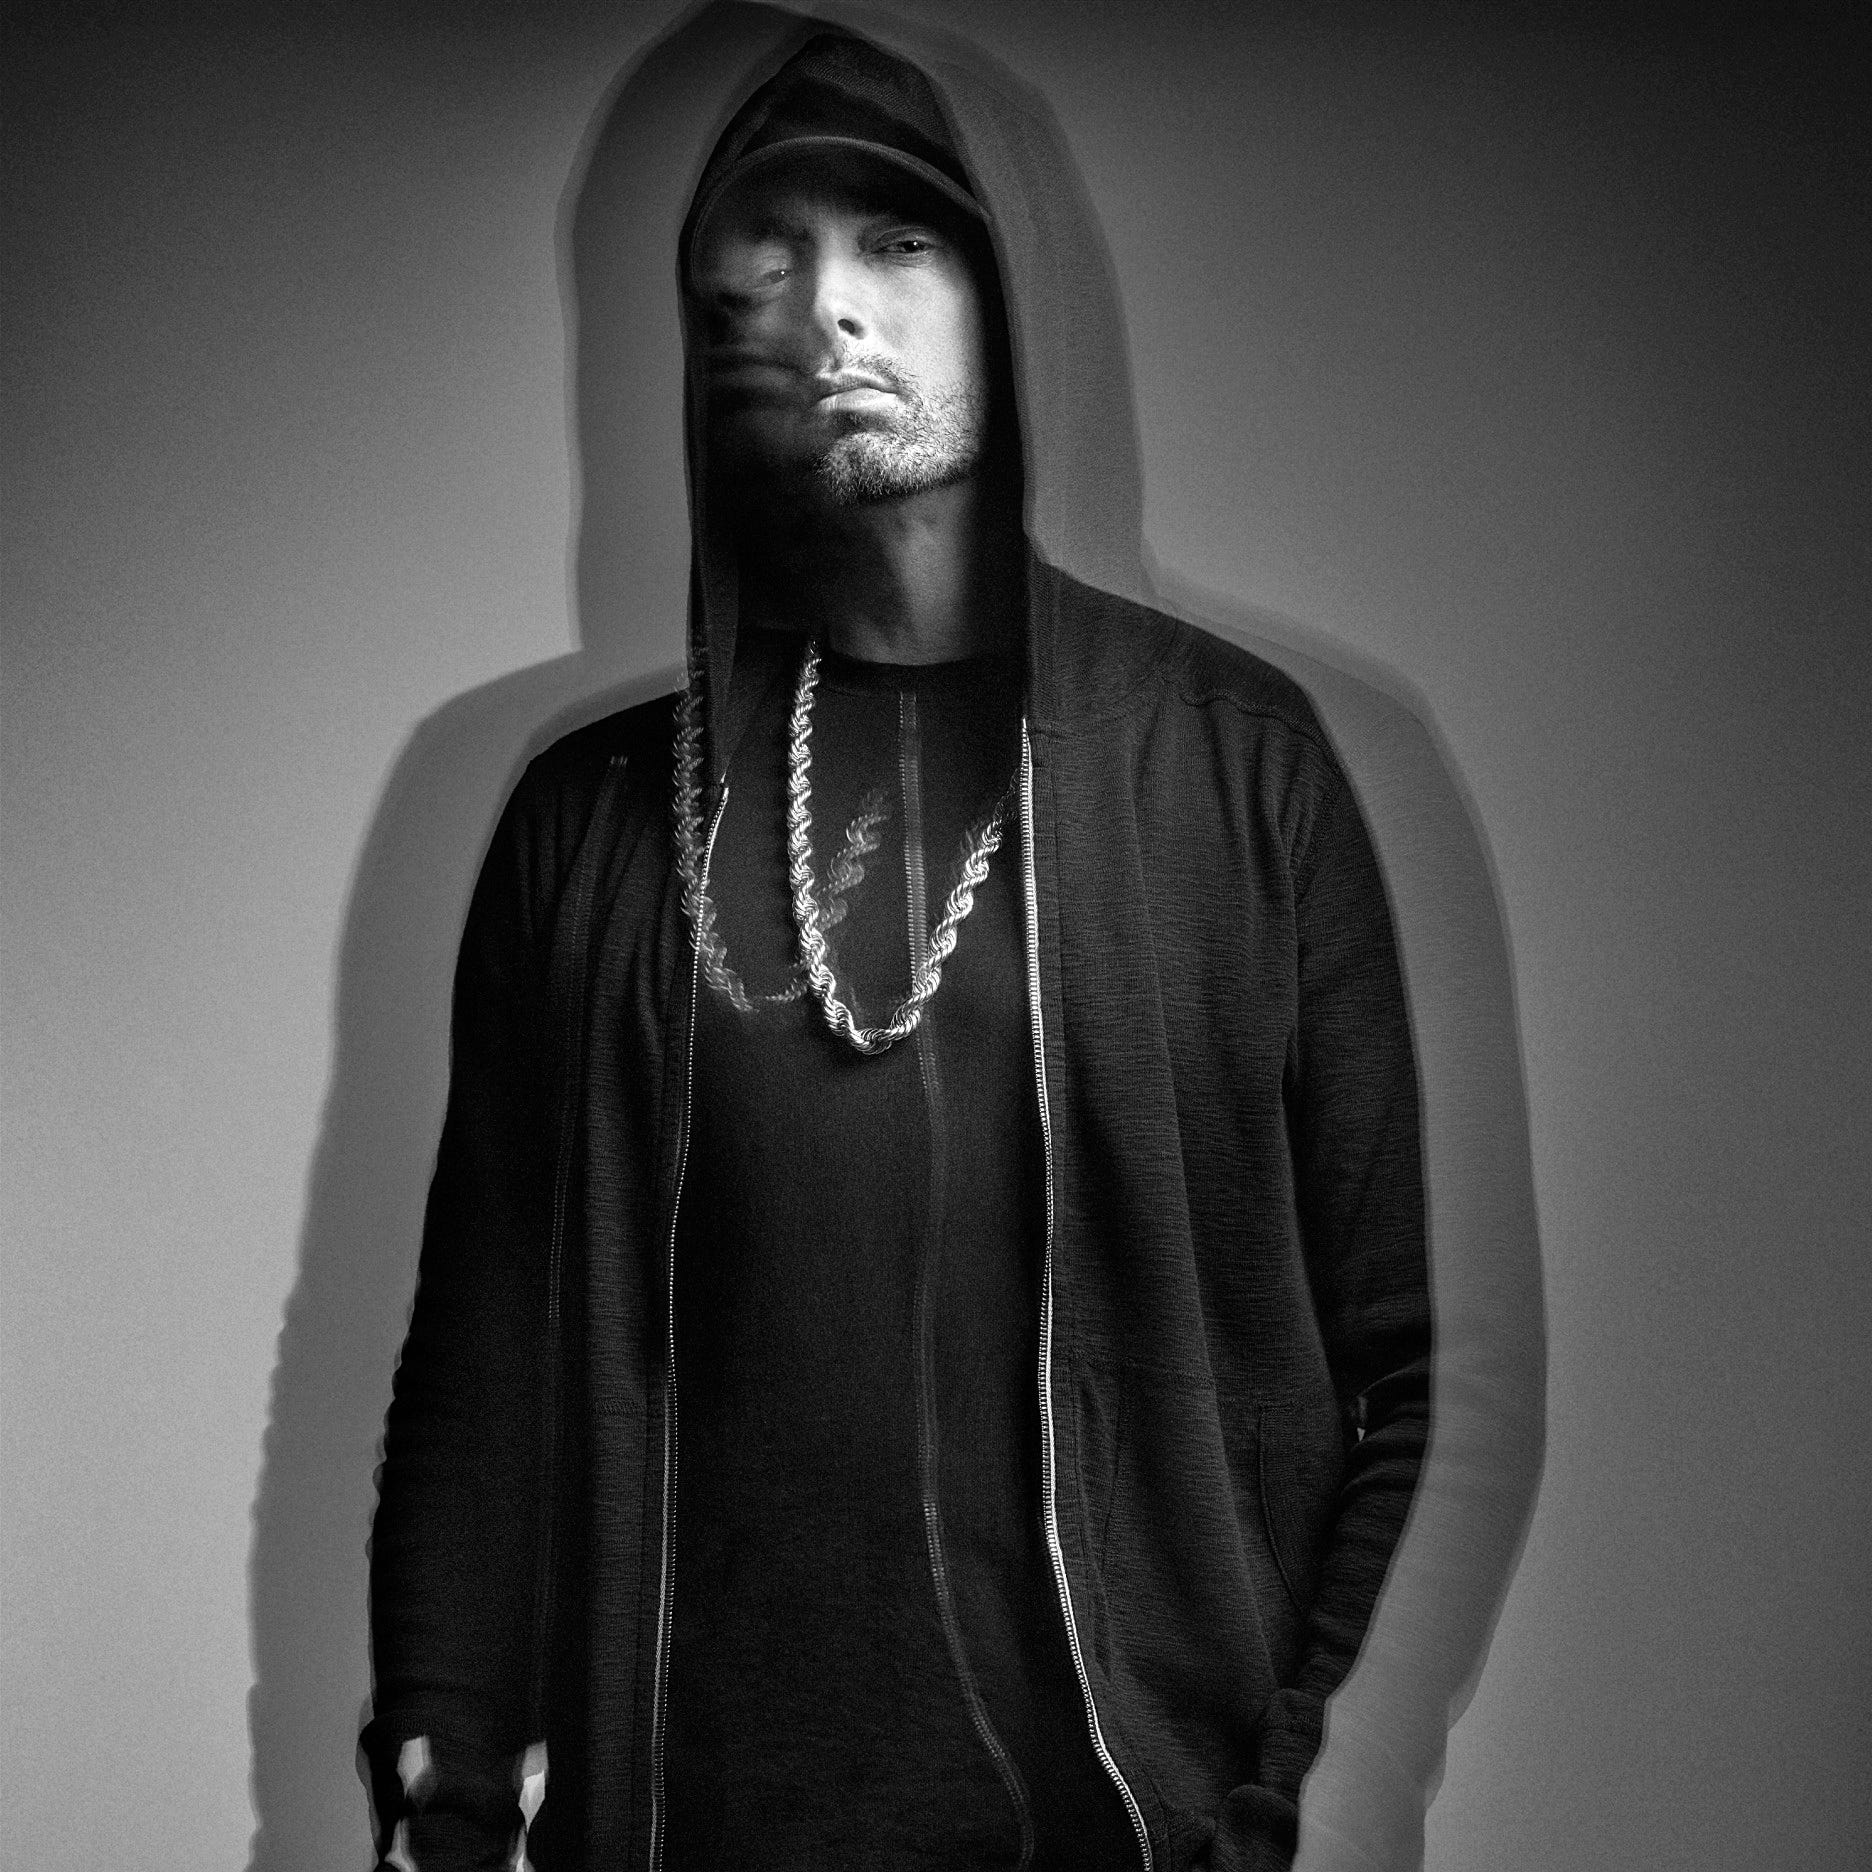 Eminem responds to Machine Gun Kelly track: 'It just felt pitiful'